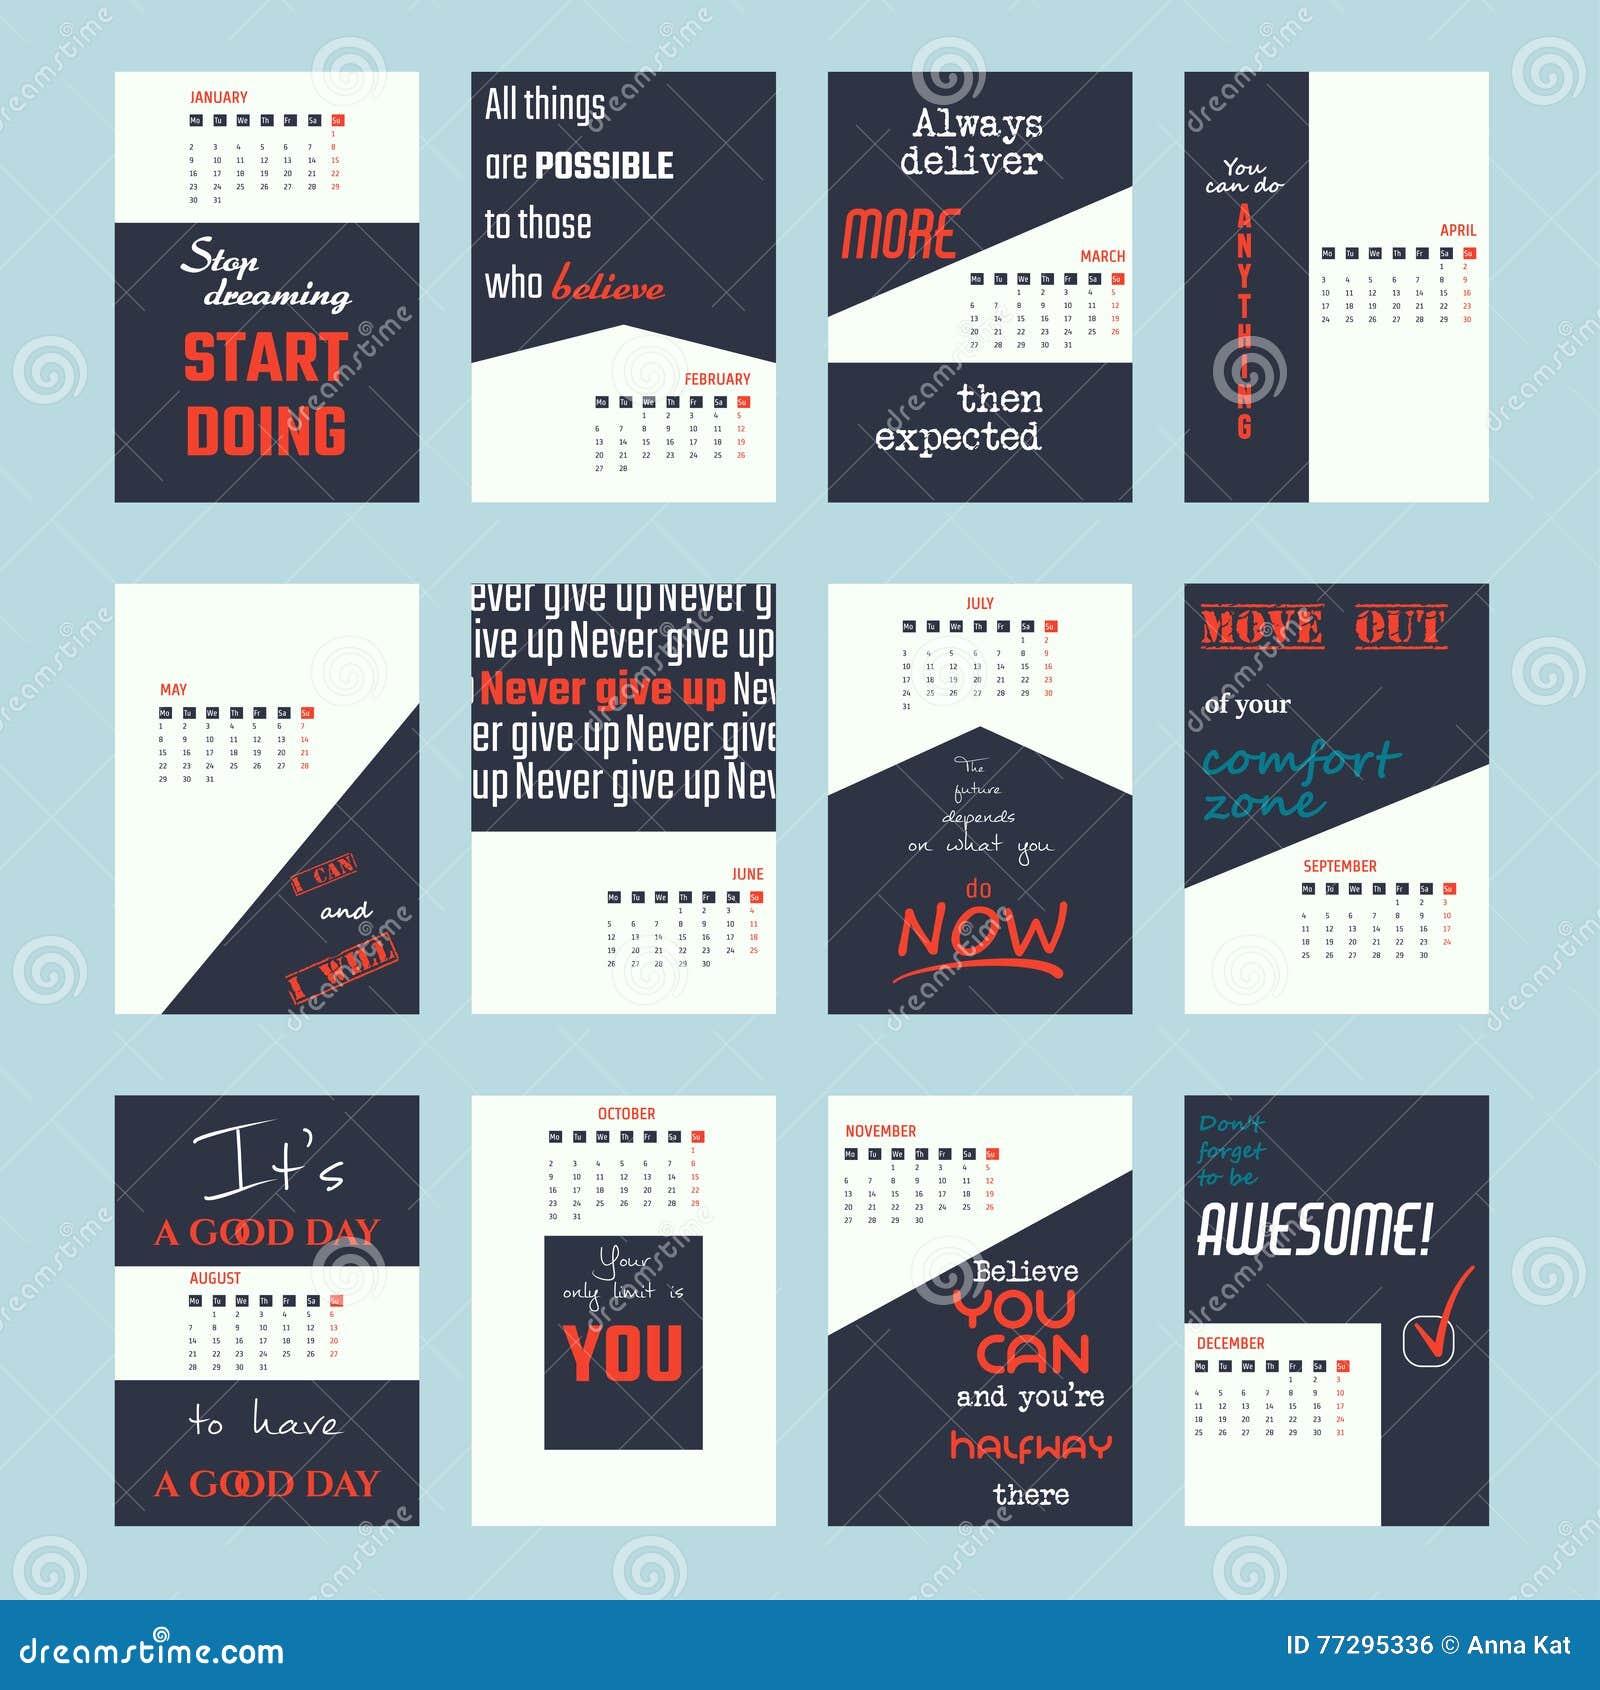 Calendar Layout Design Inspiration : Motivation quotes calendar stock vector image